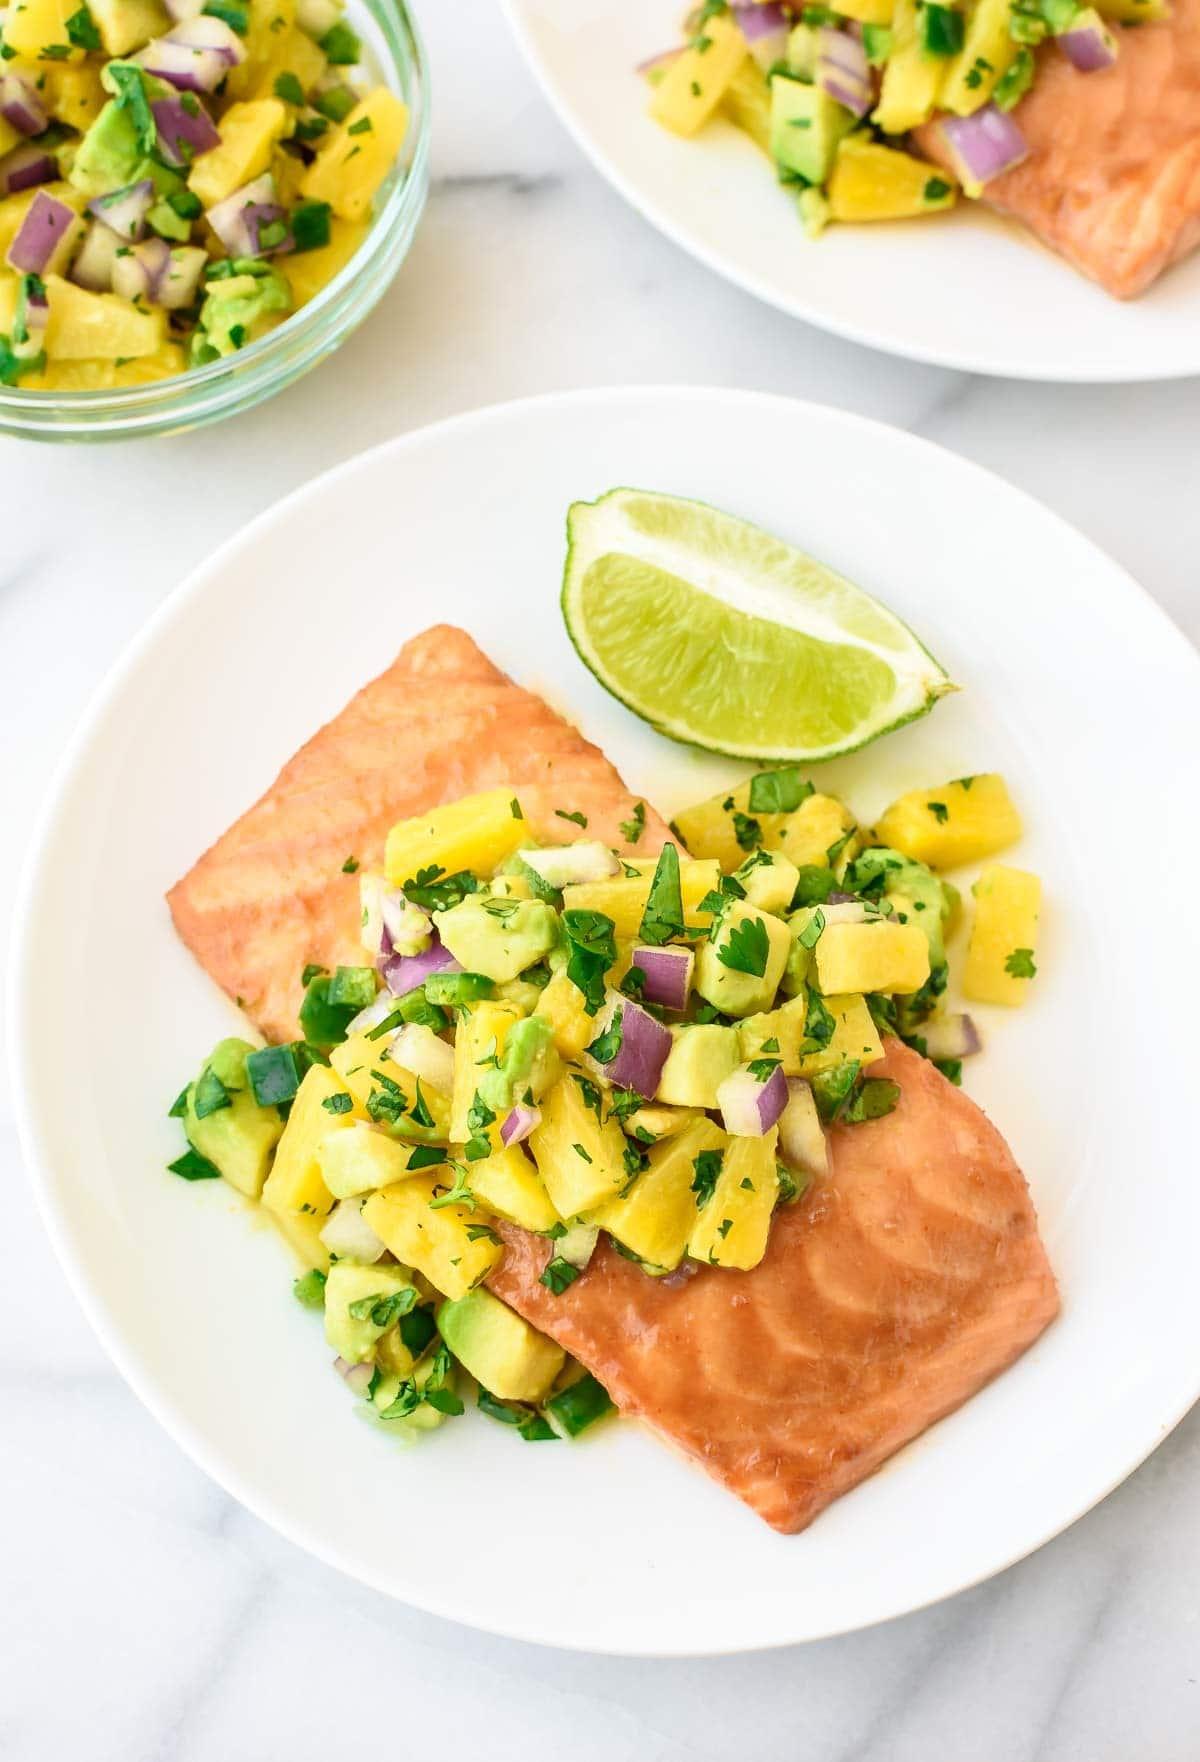 Glazed Salmon with Pineapple Salsa